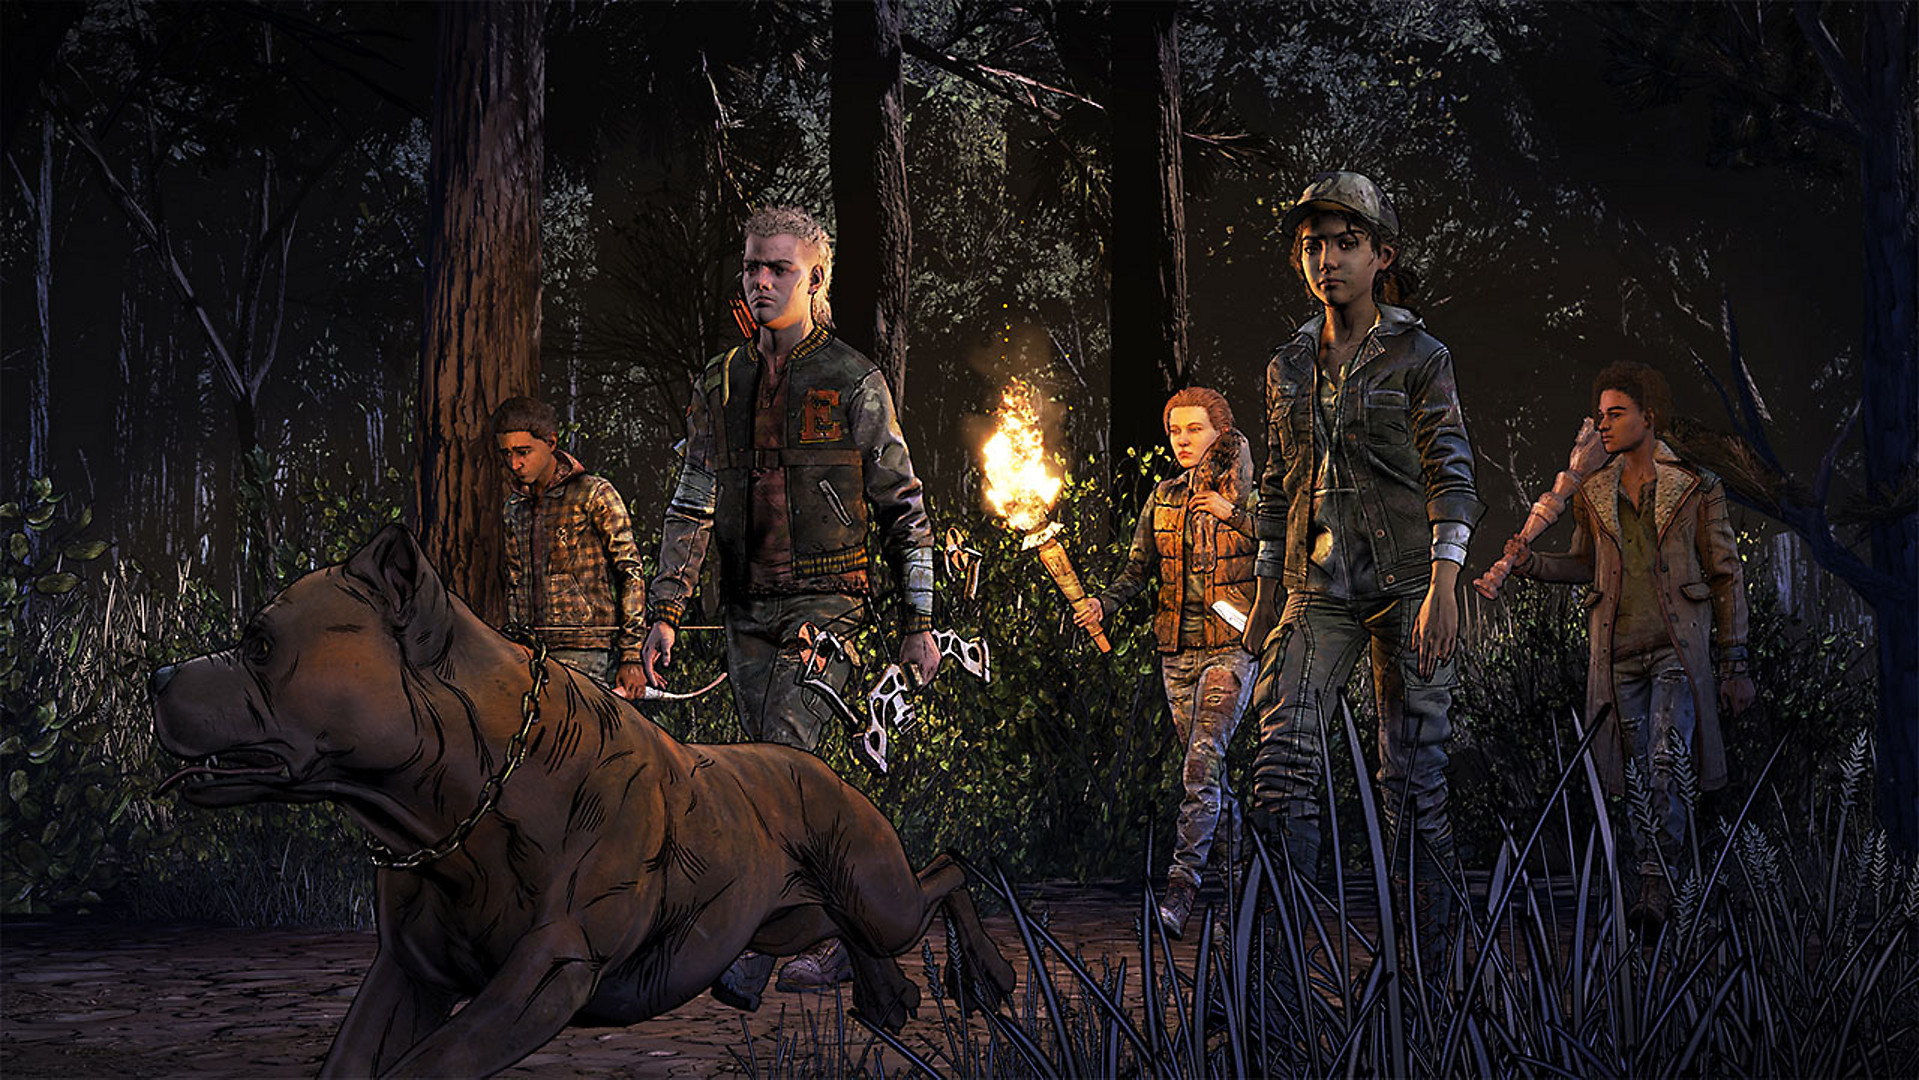 The Walking Dead - The Final Season - Episode 3 'Broken Toys